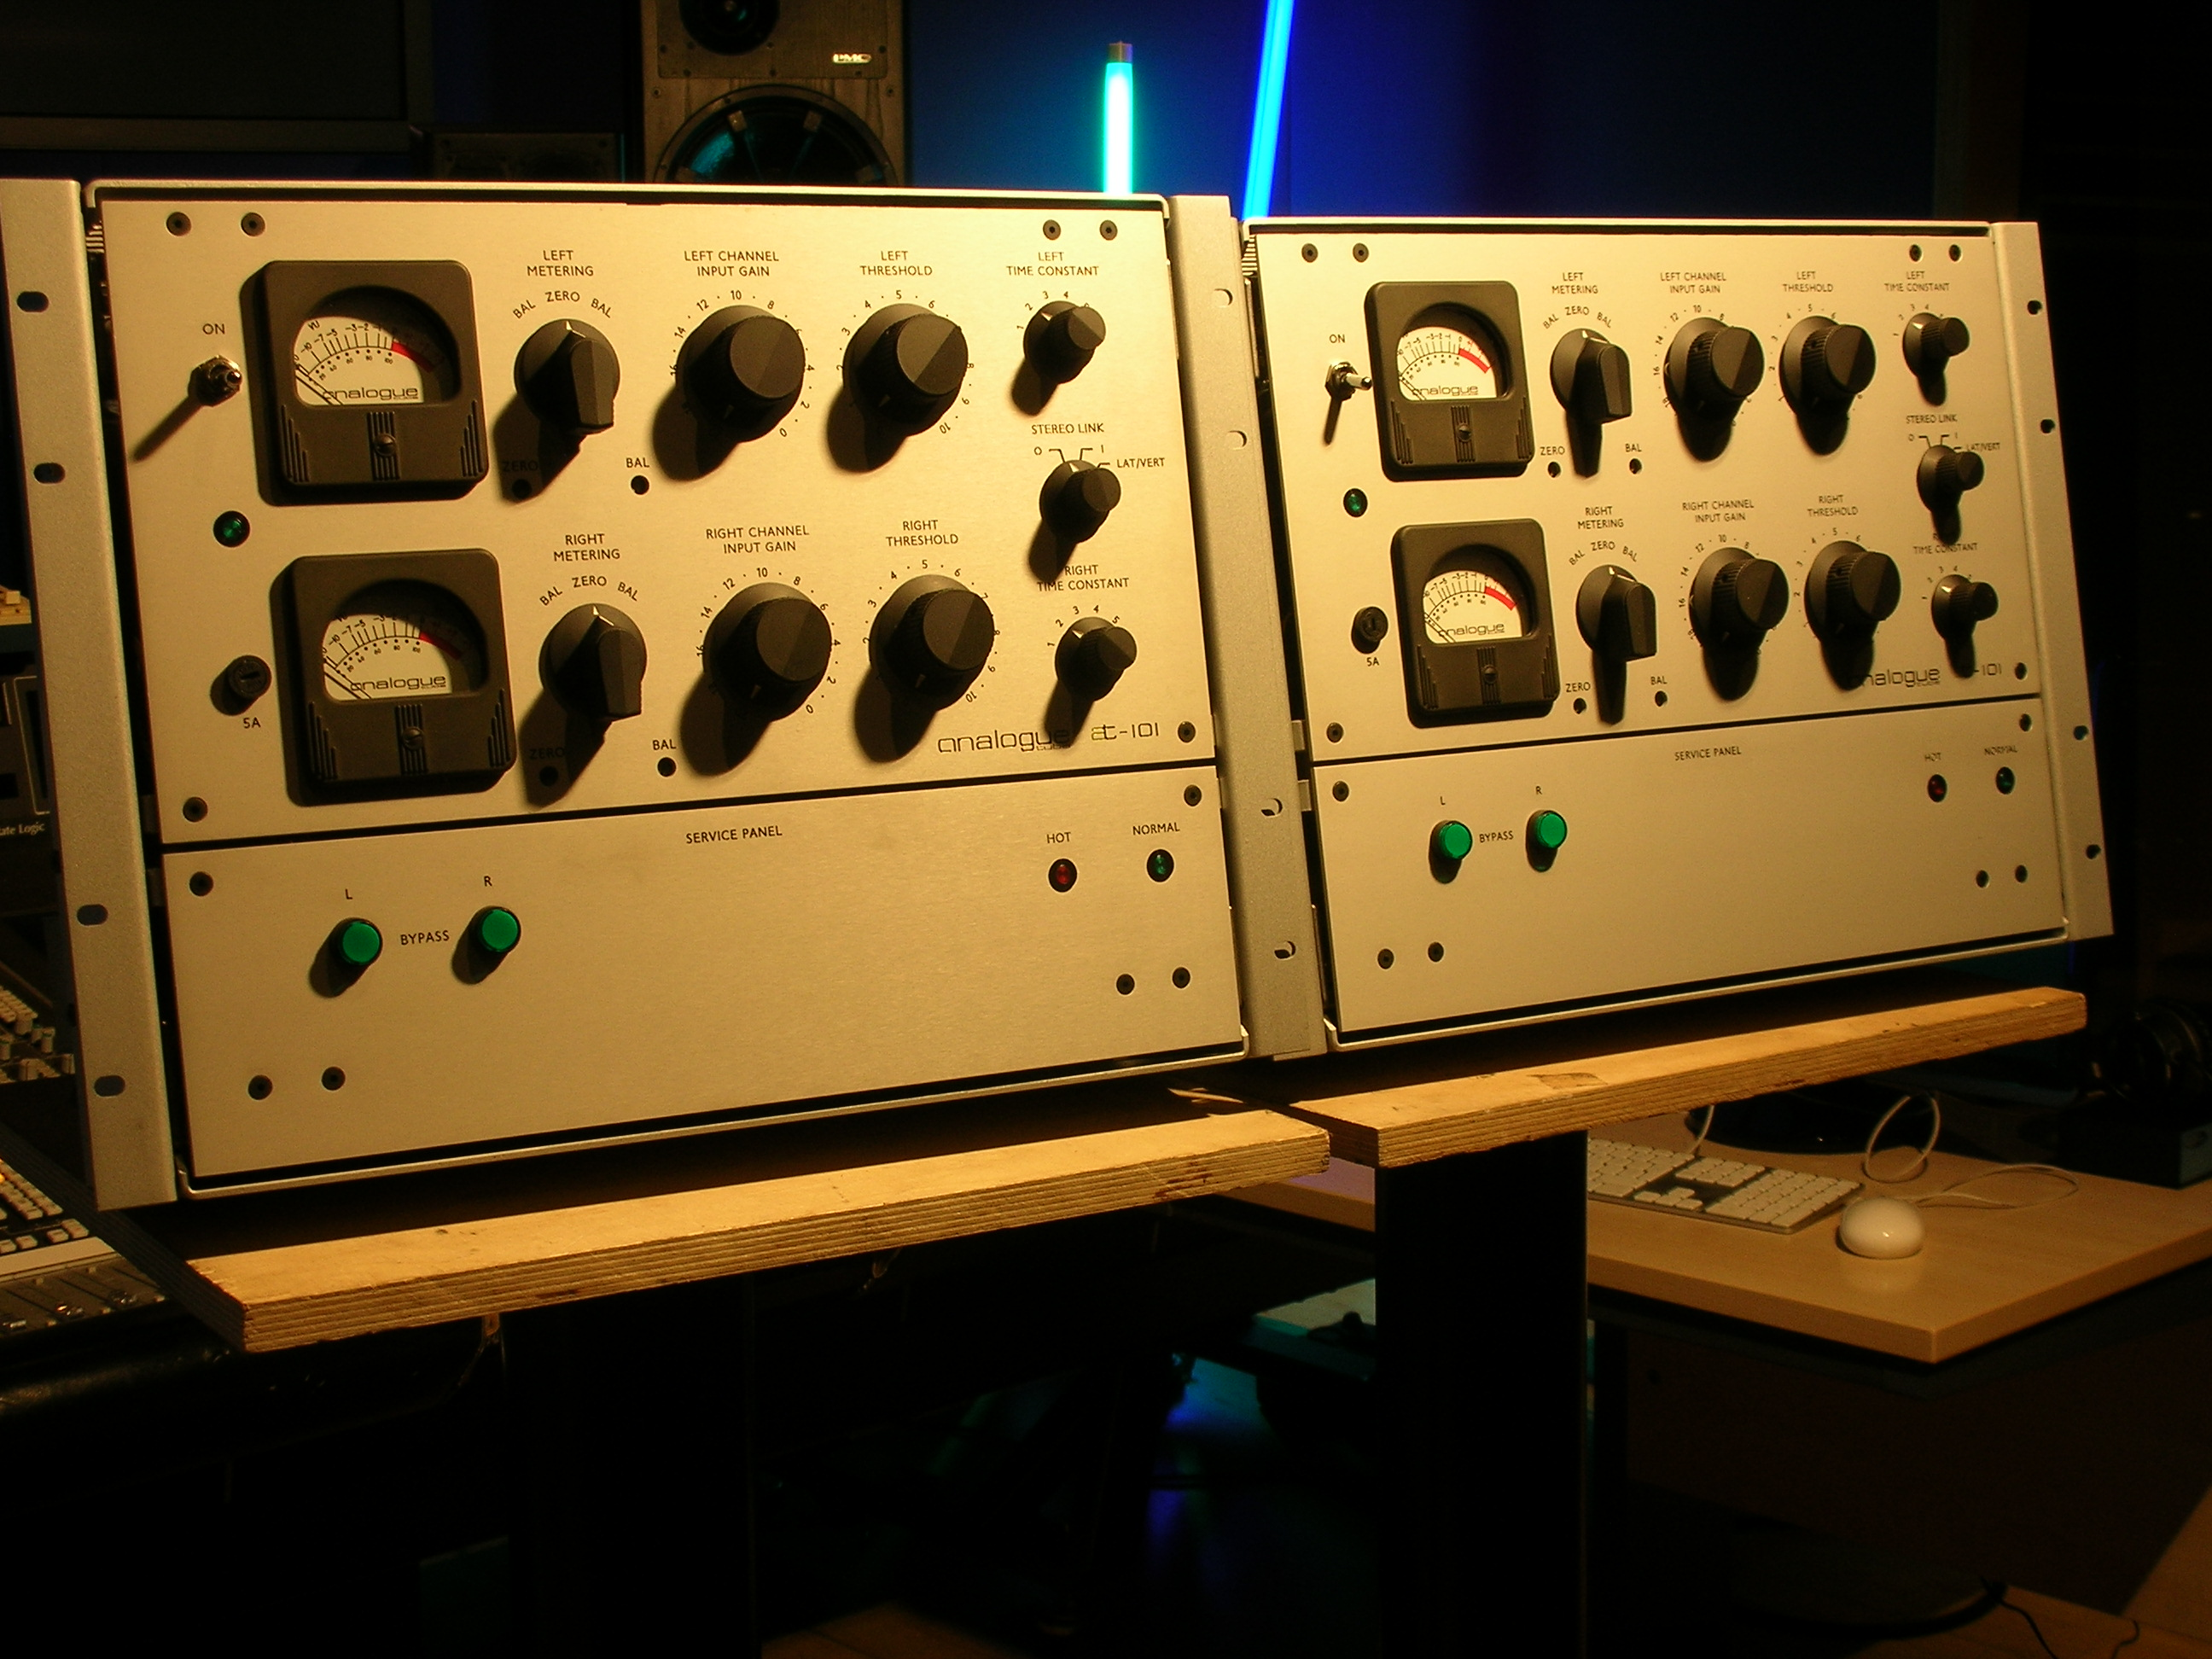 Alex Pizzorni - Dual Stereo AT-101